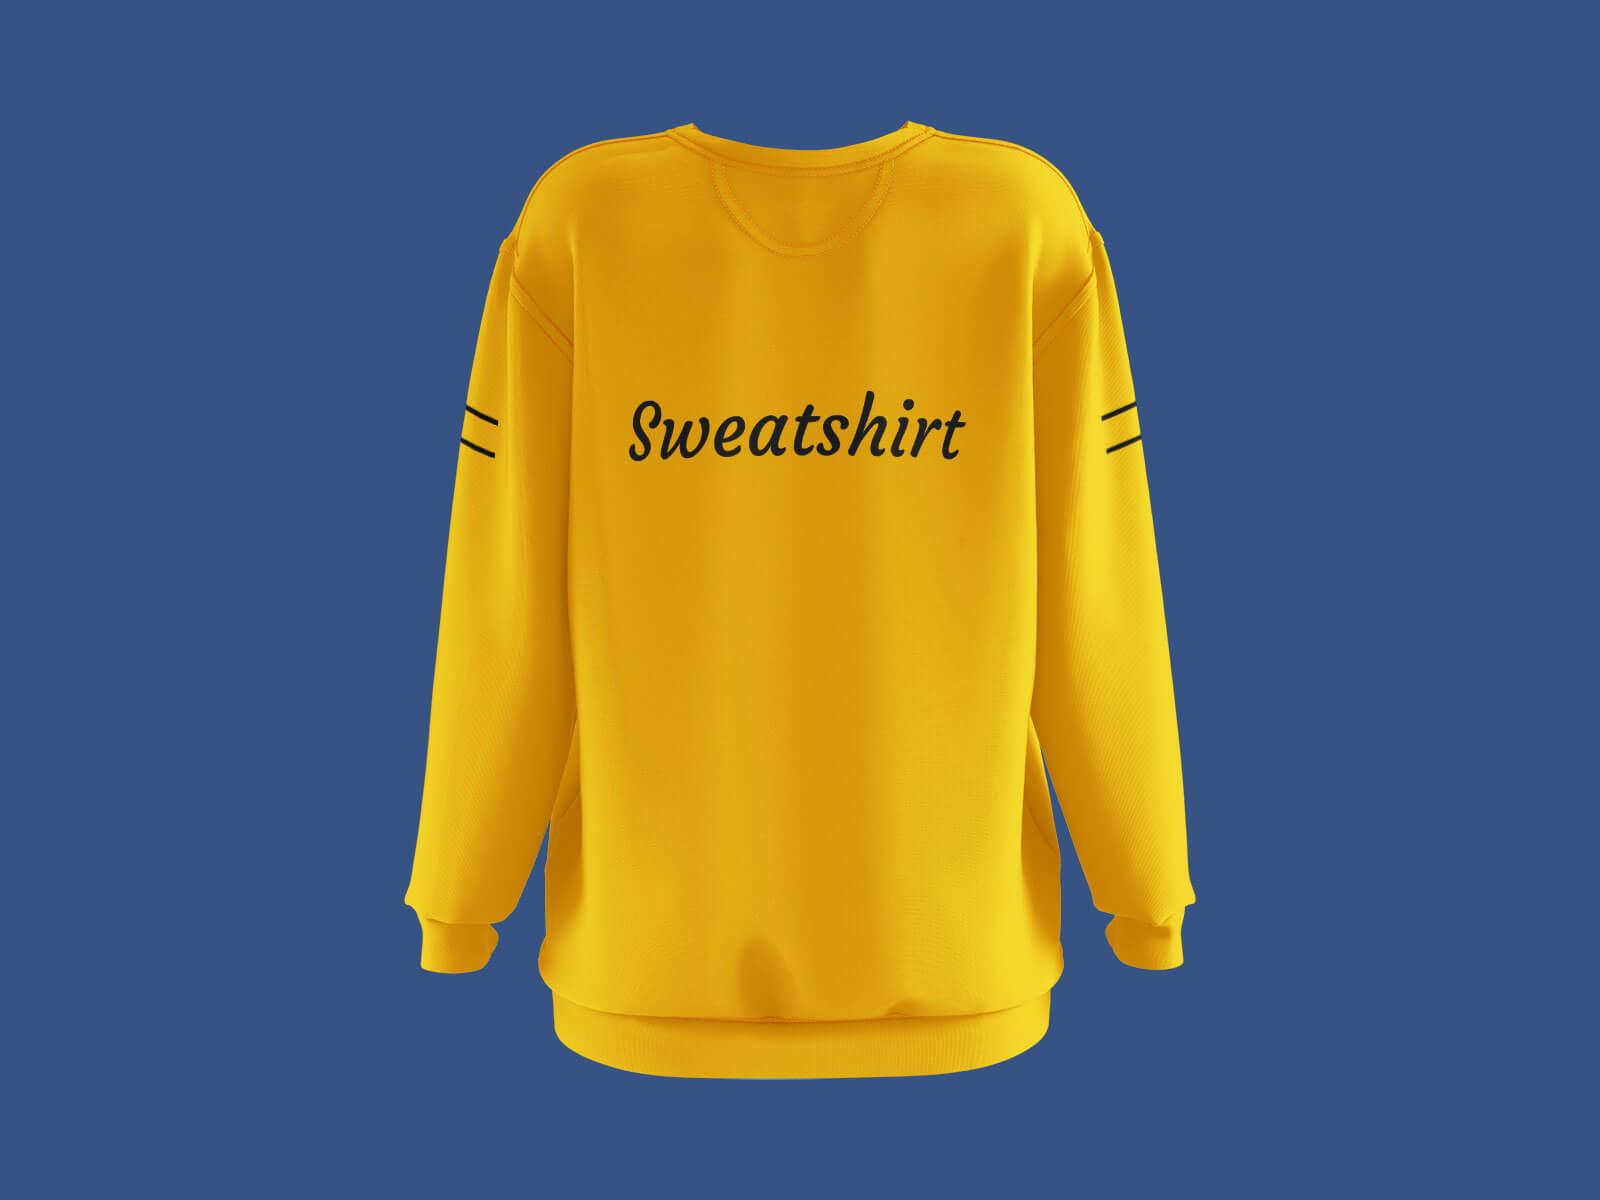 Free Long Sleeves Women's Sweatshirt Mockup PSD Set (3)